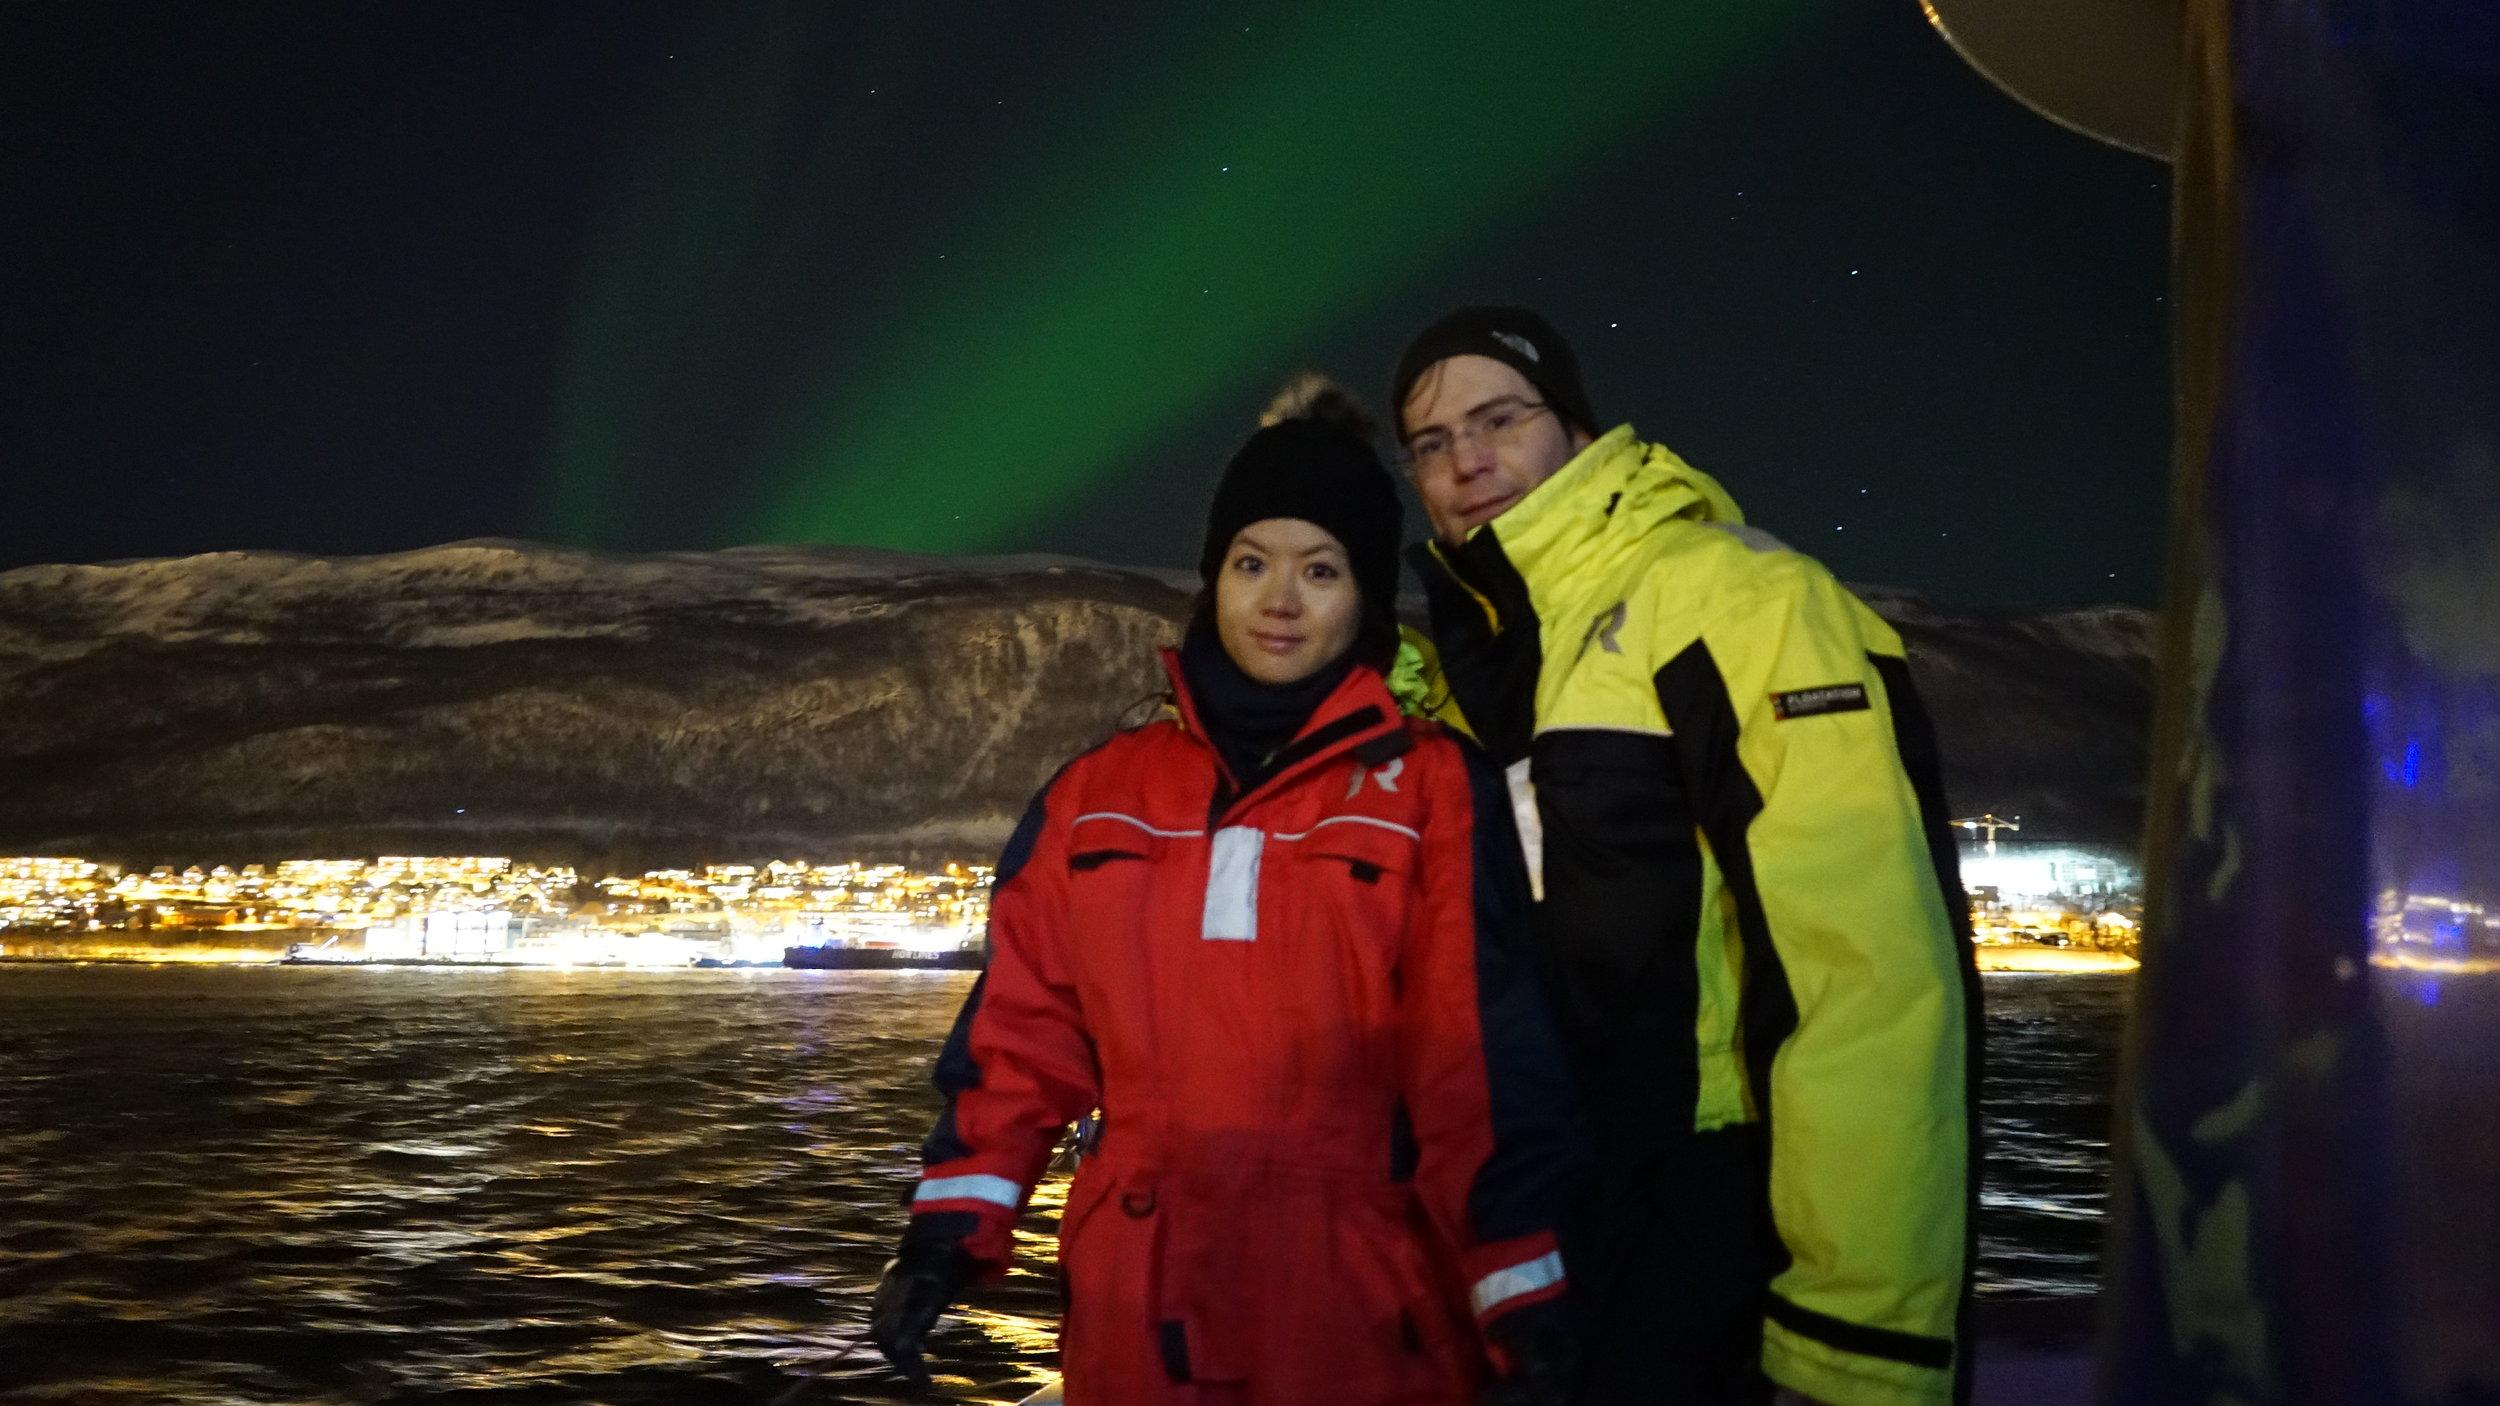 #Northernlight | #AuroraBoreal | #Tromso